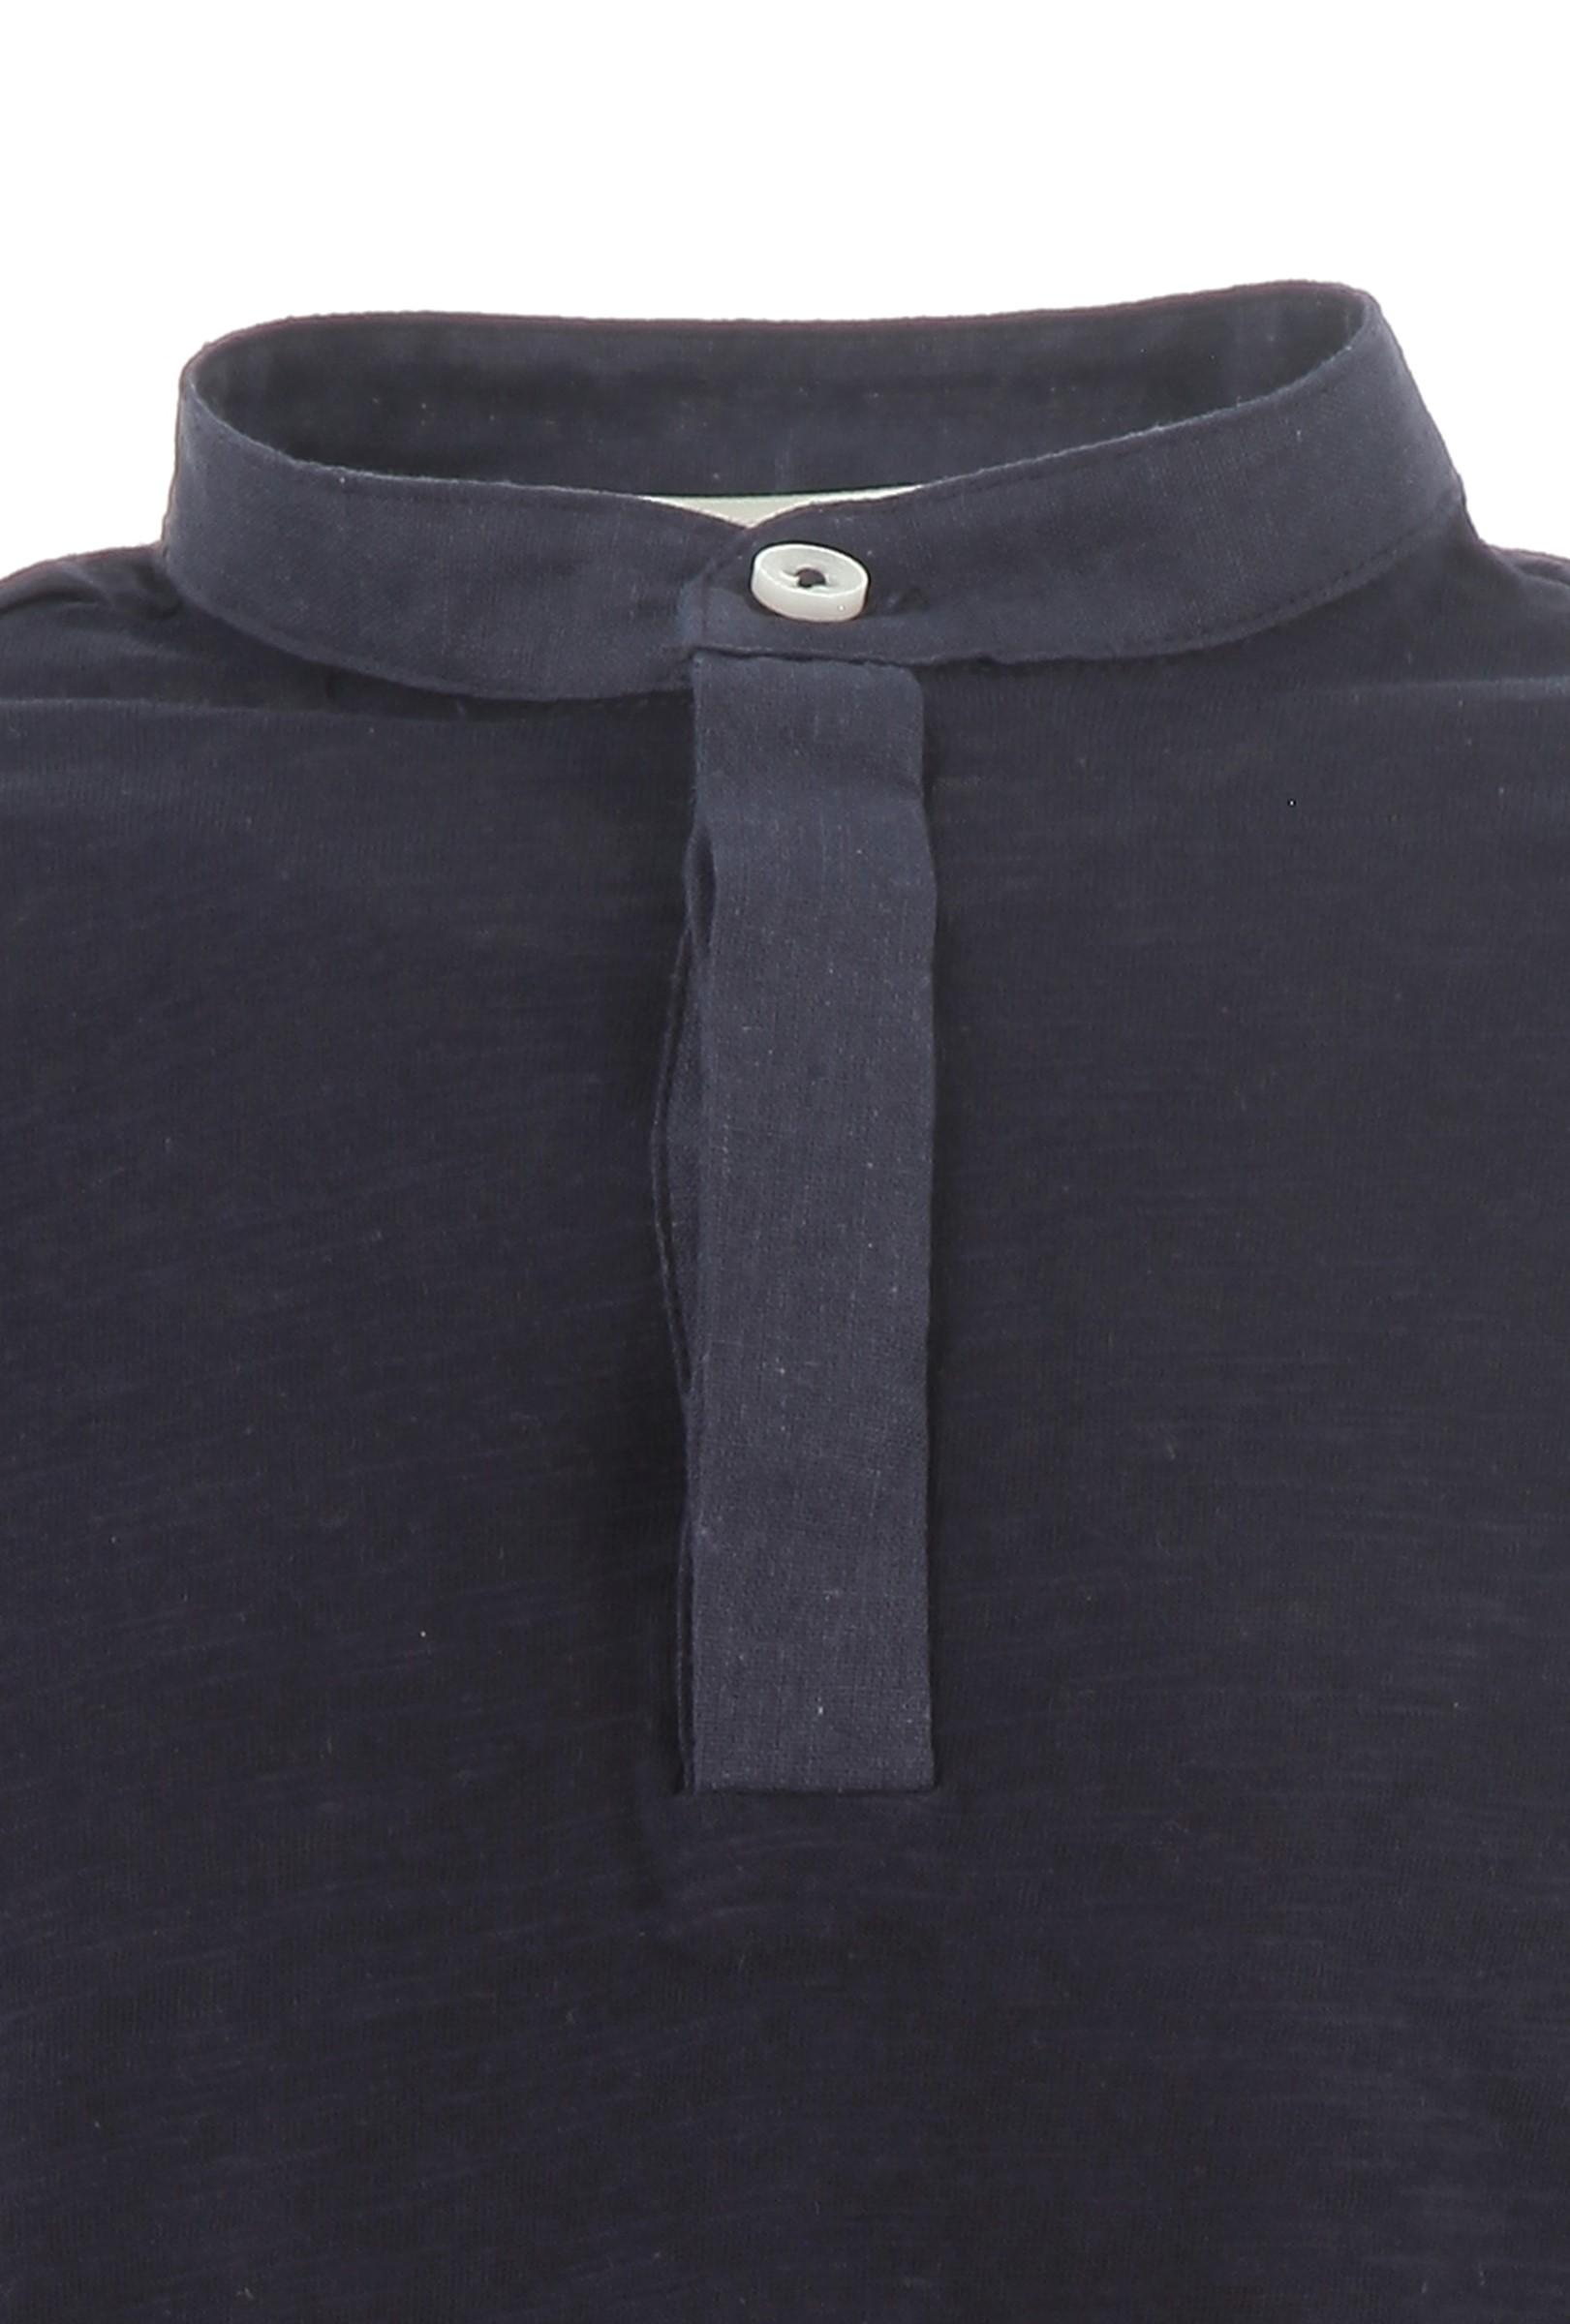 Paolo Pecora shirt PAOLO PECORA | Shirt | PP2346BLU